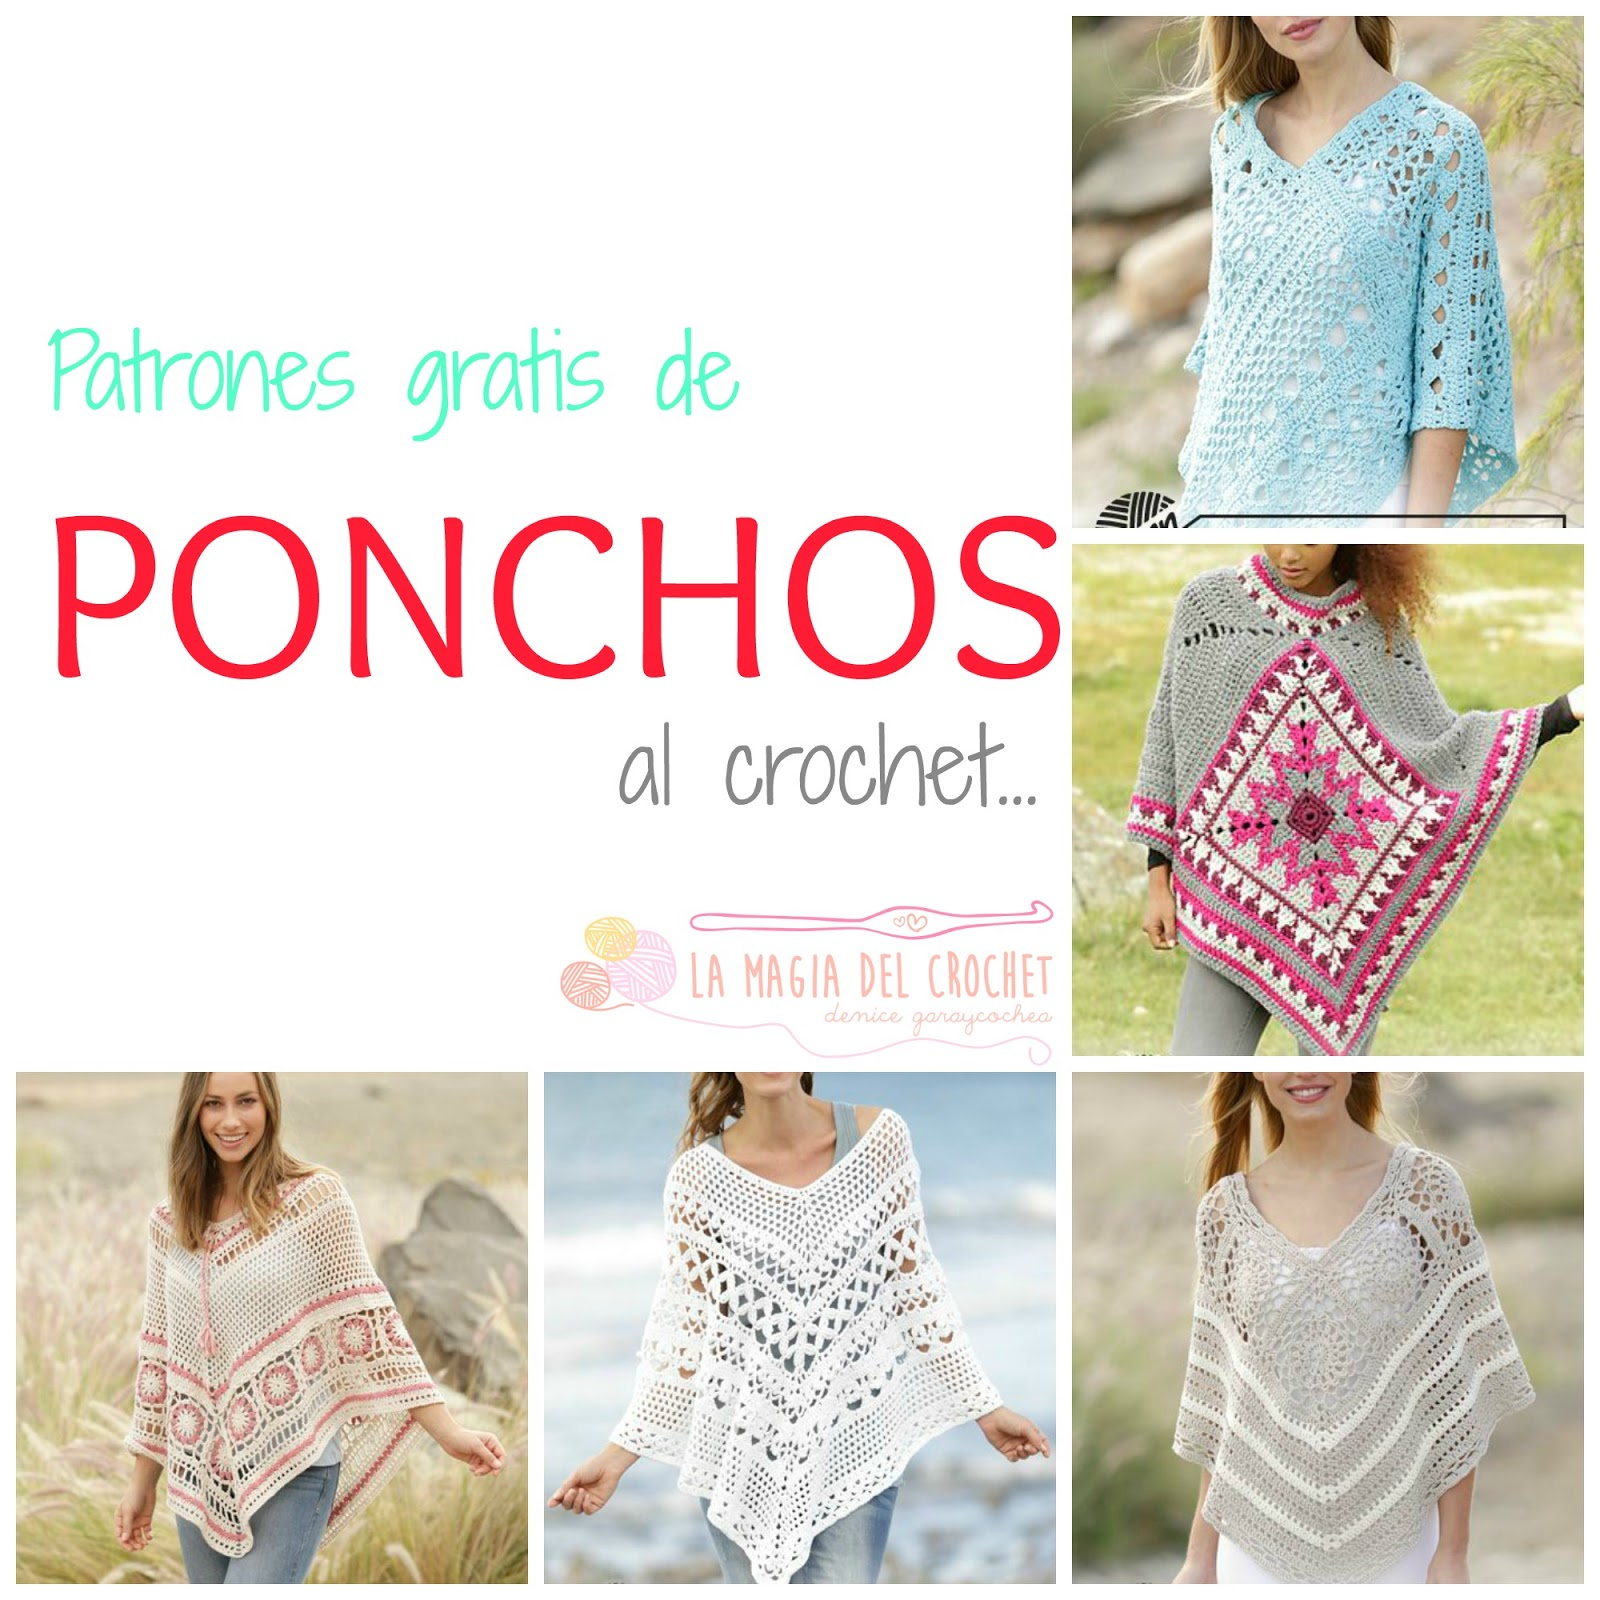 La Magia del Crochet: PONCHOS A CROCHET